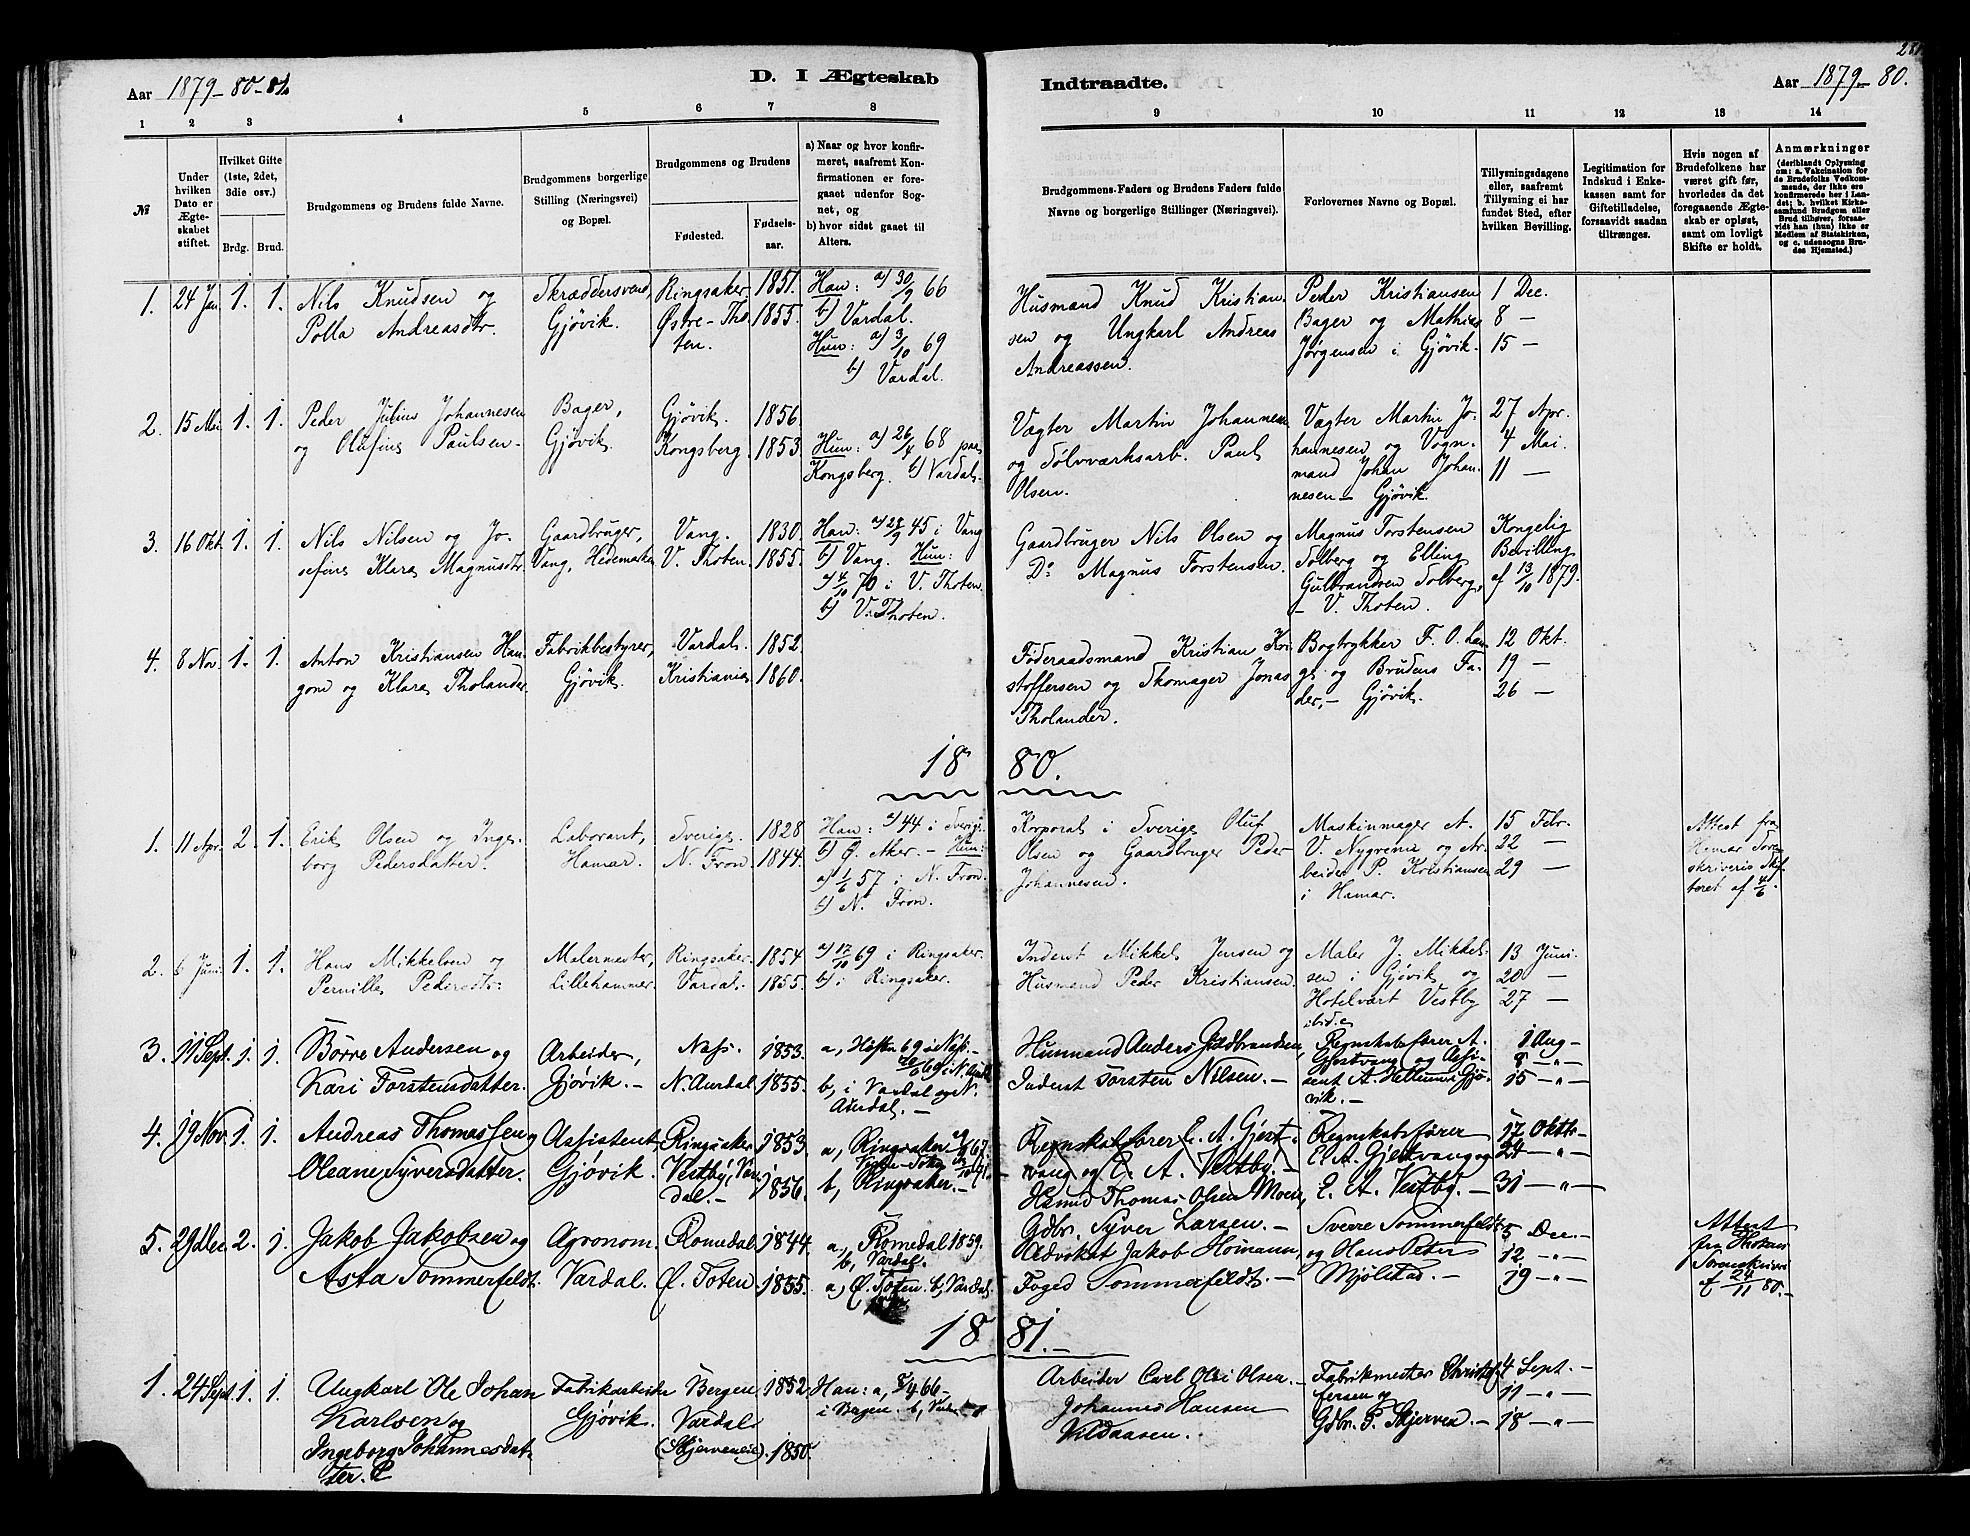 SAH, Vardal prestekontor, H/Ha/Haa/L0008: Ministerialbok nr. 8, 1878-1890, s. 281